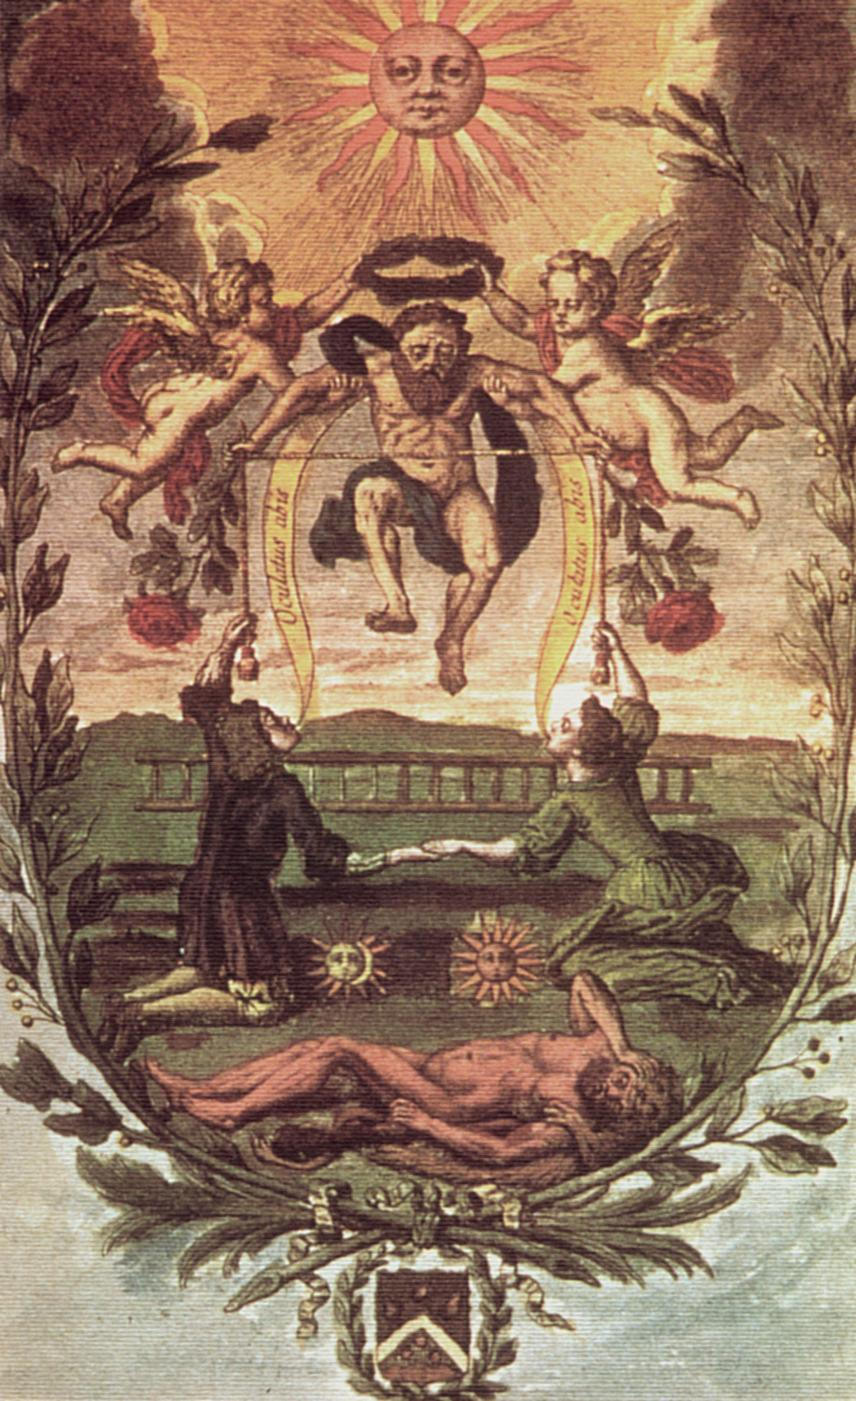 Mutus Liber Images